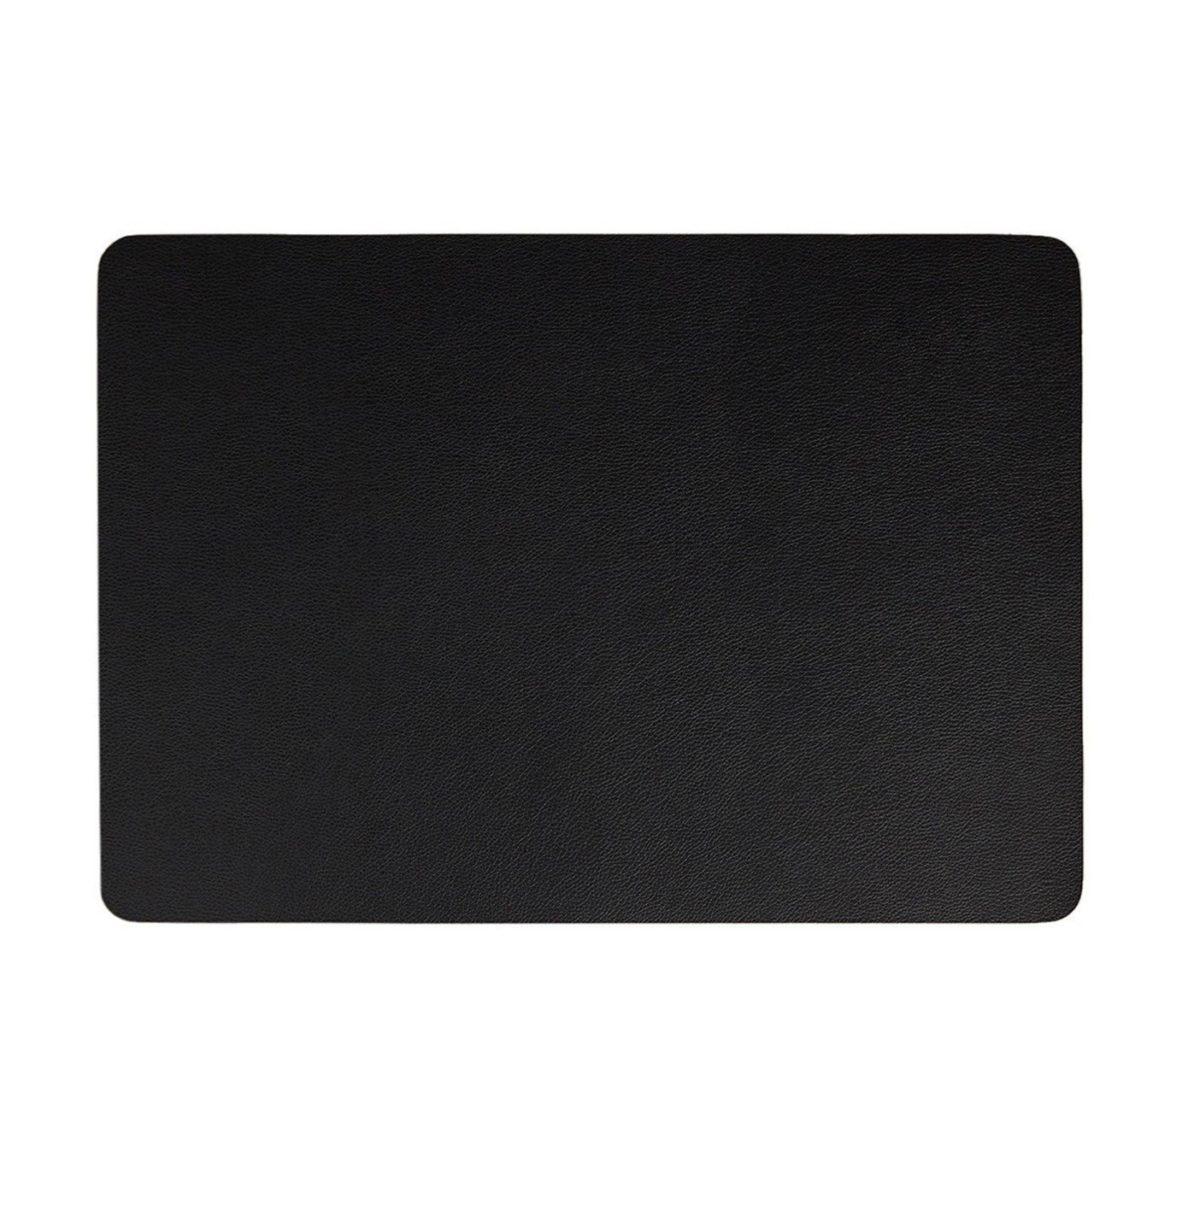 schermafbeelding 2019 10 19 om 12.19.16 1200x1222 - Placemat Leather optic fine black 46*33 cm (7805420)